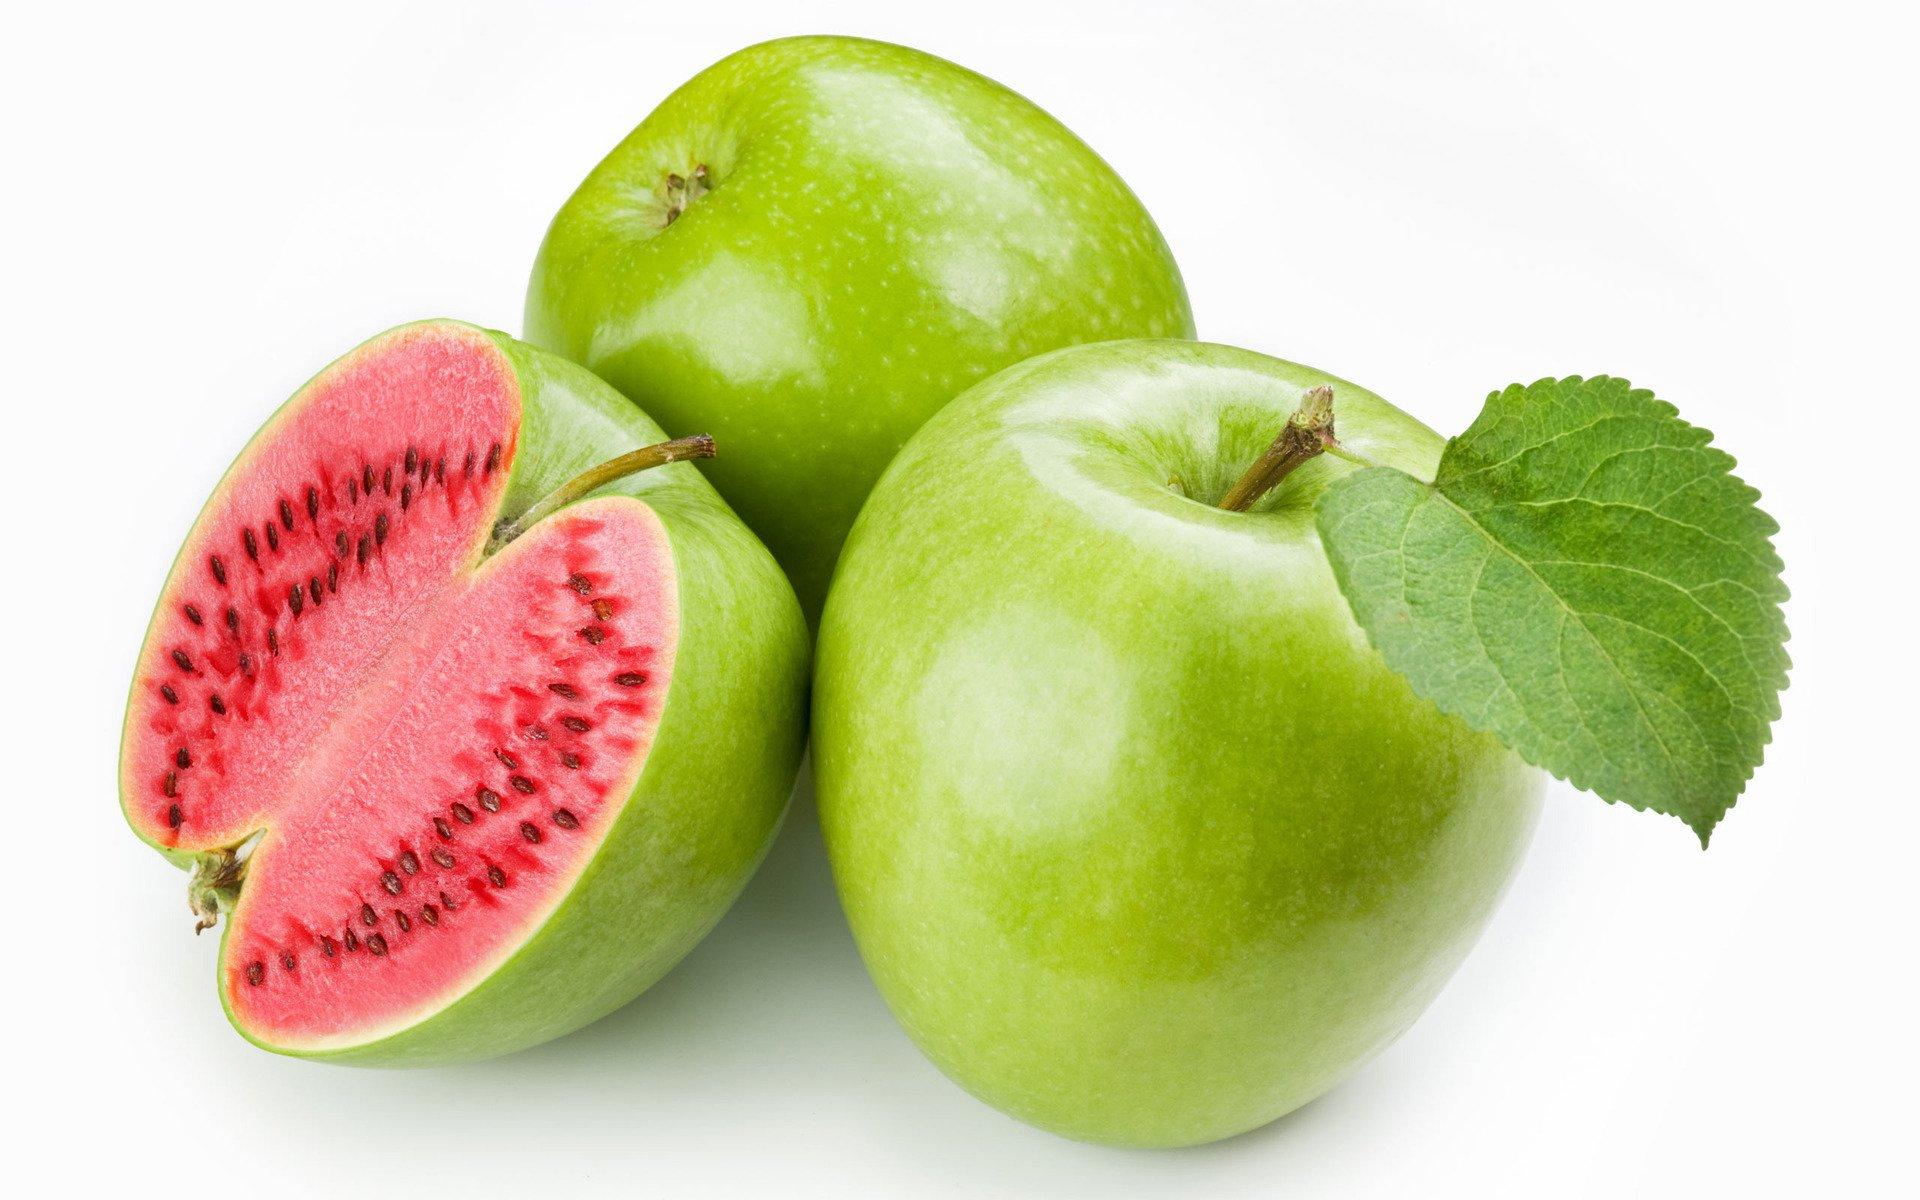 Apple Fruit Backgrounds HD Wallpaper  Background ID